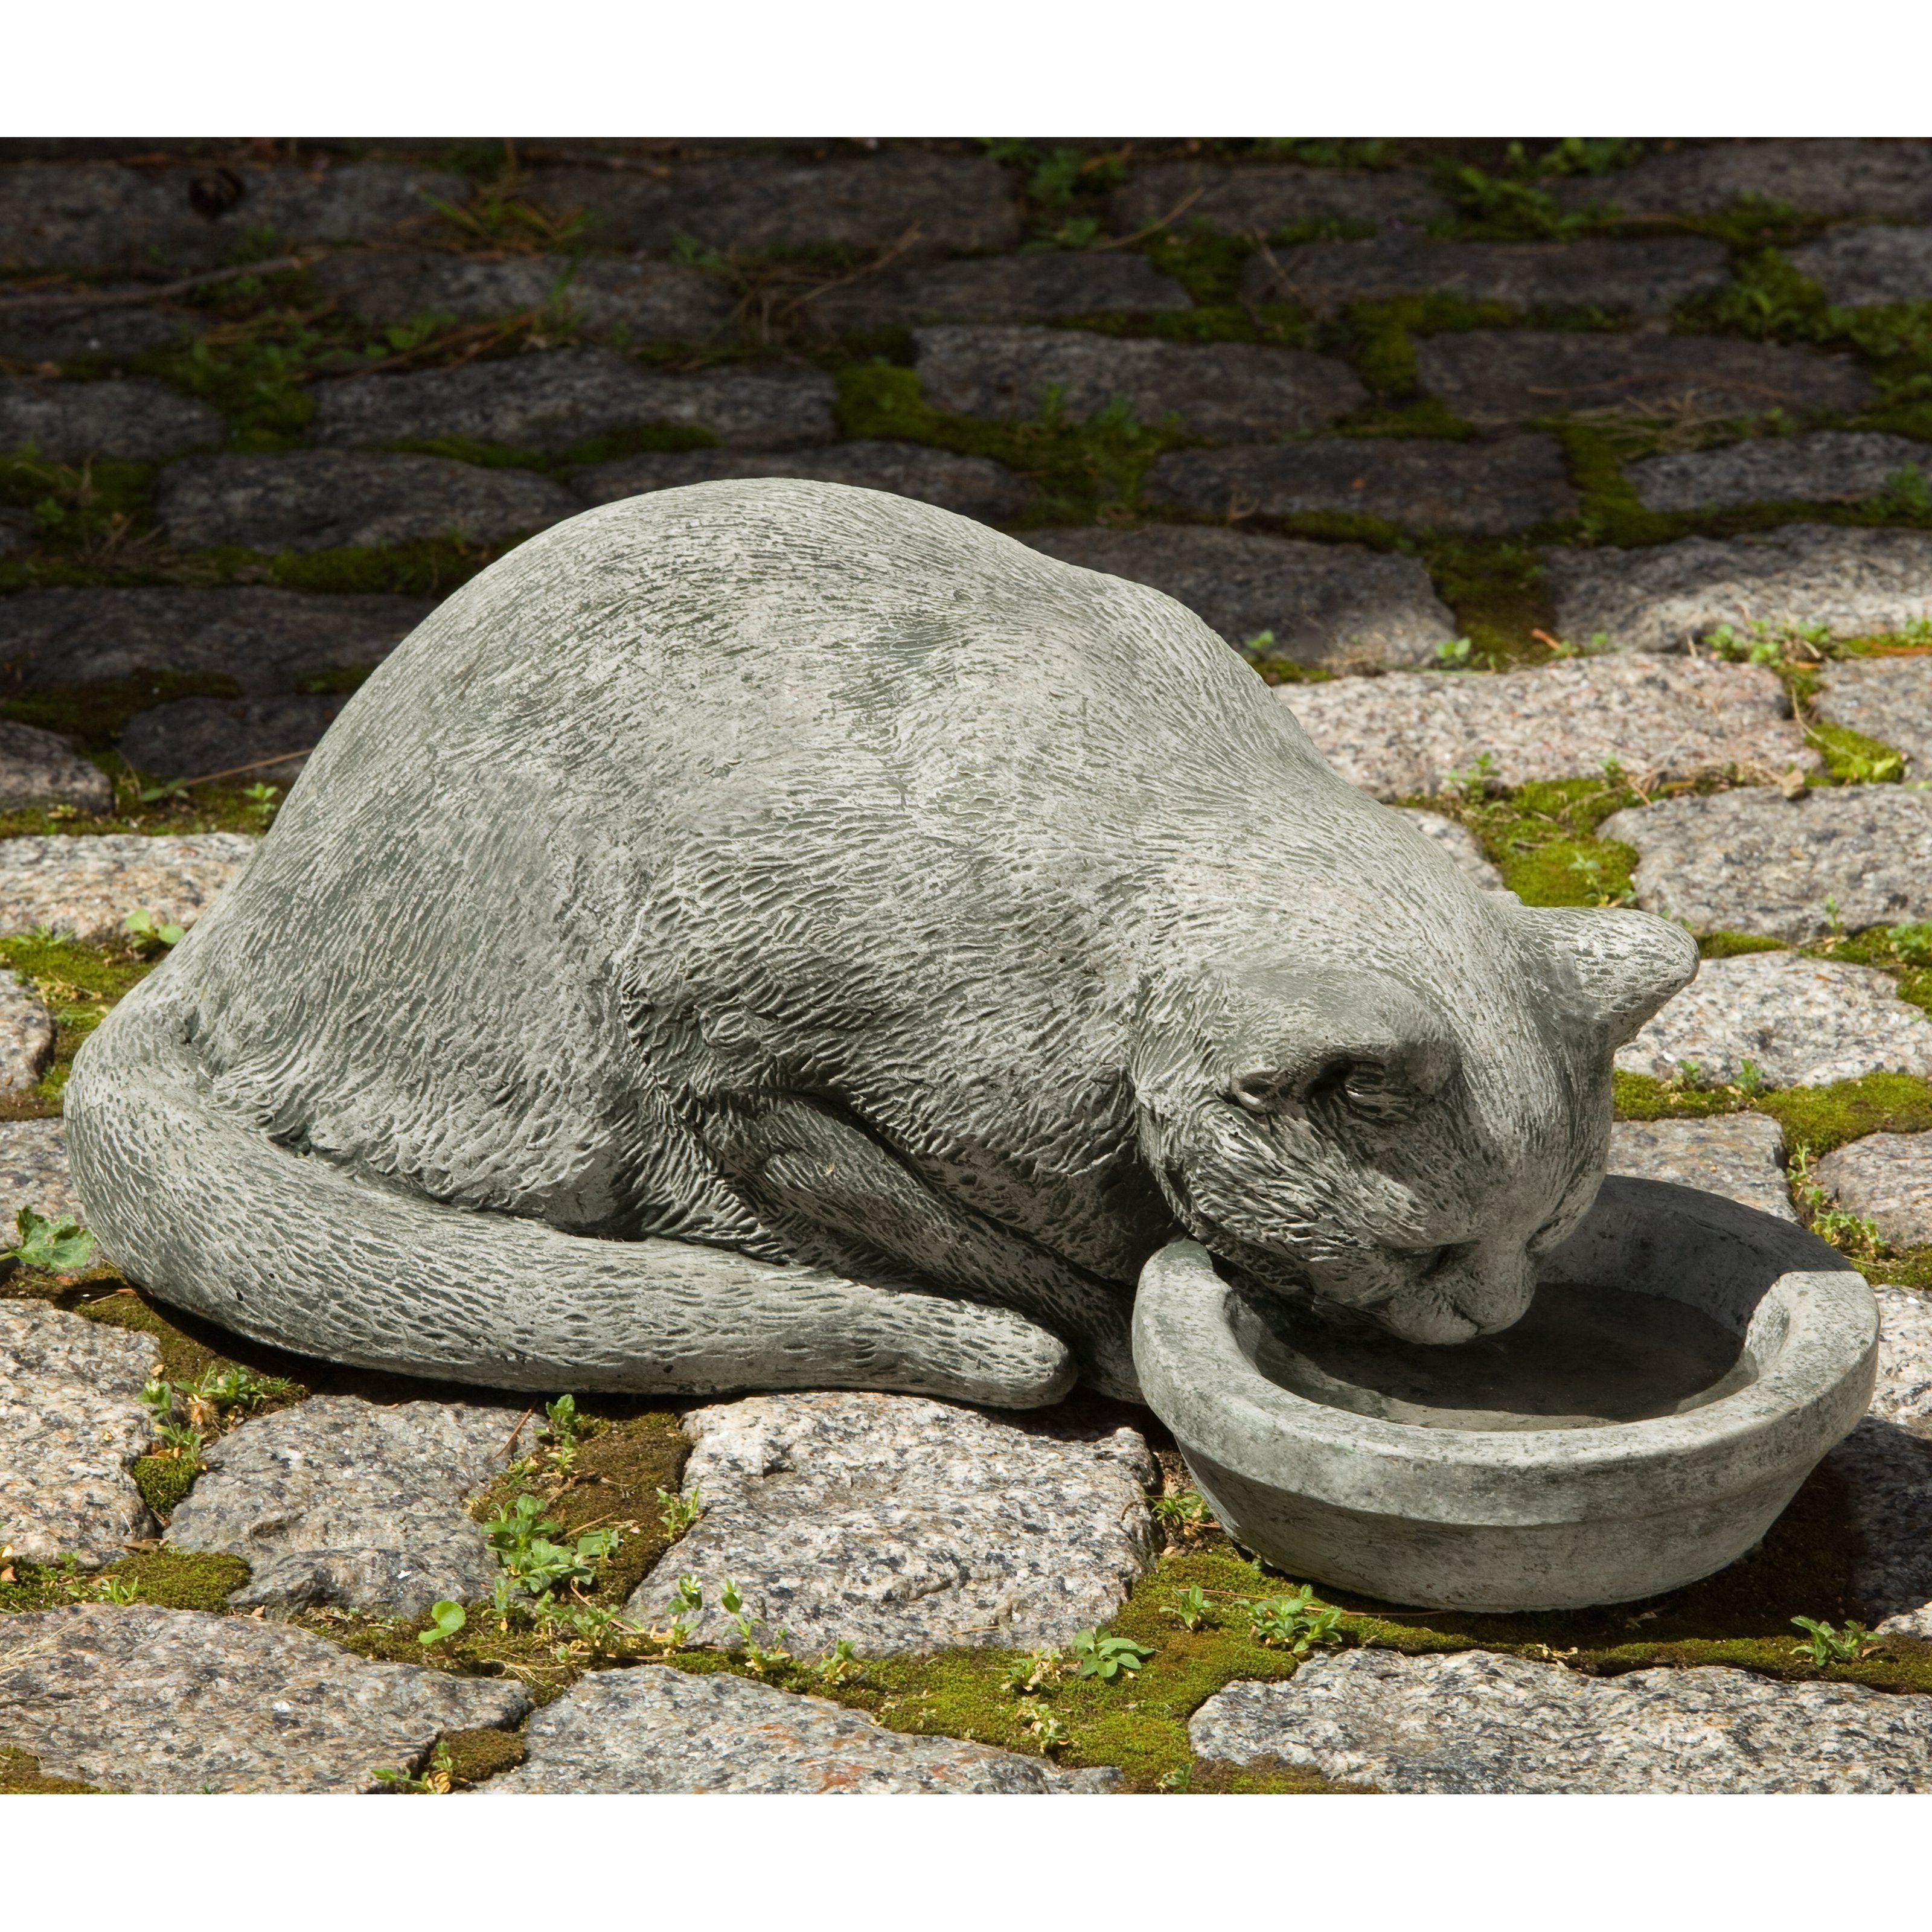 british co toscano garden pdp statue reviews the uk wayfair design fairy reading cat